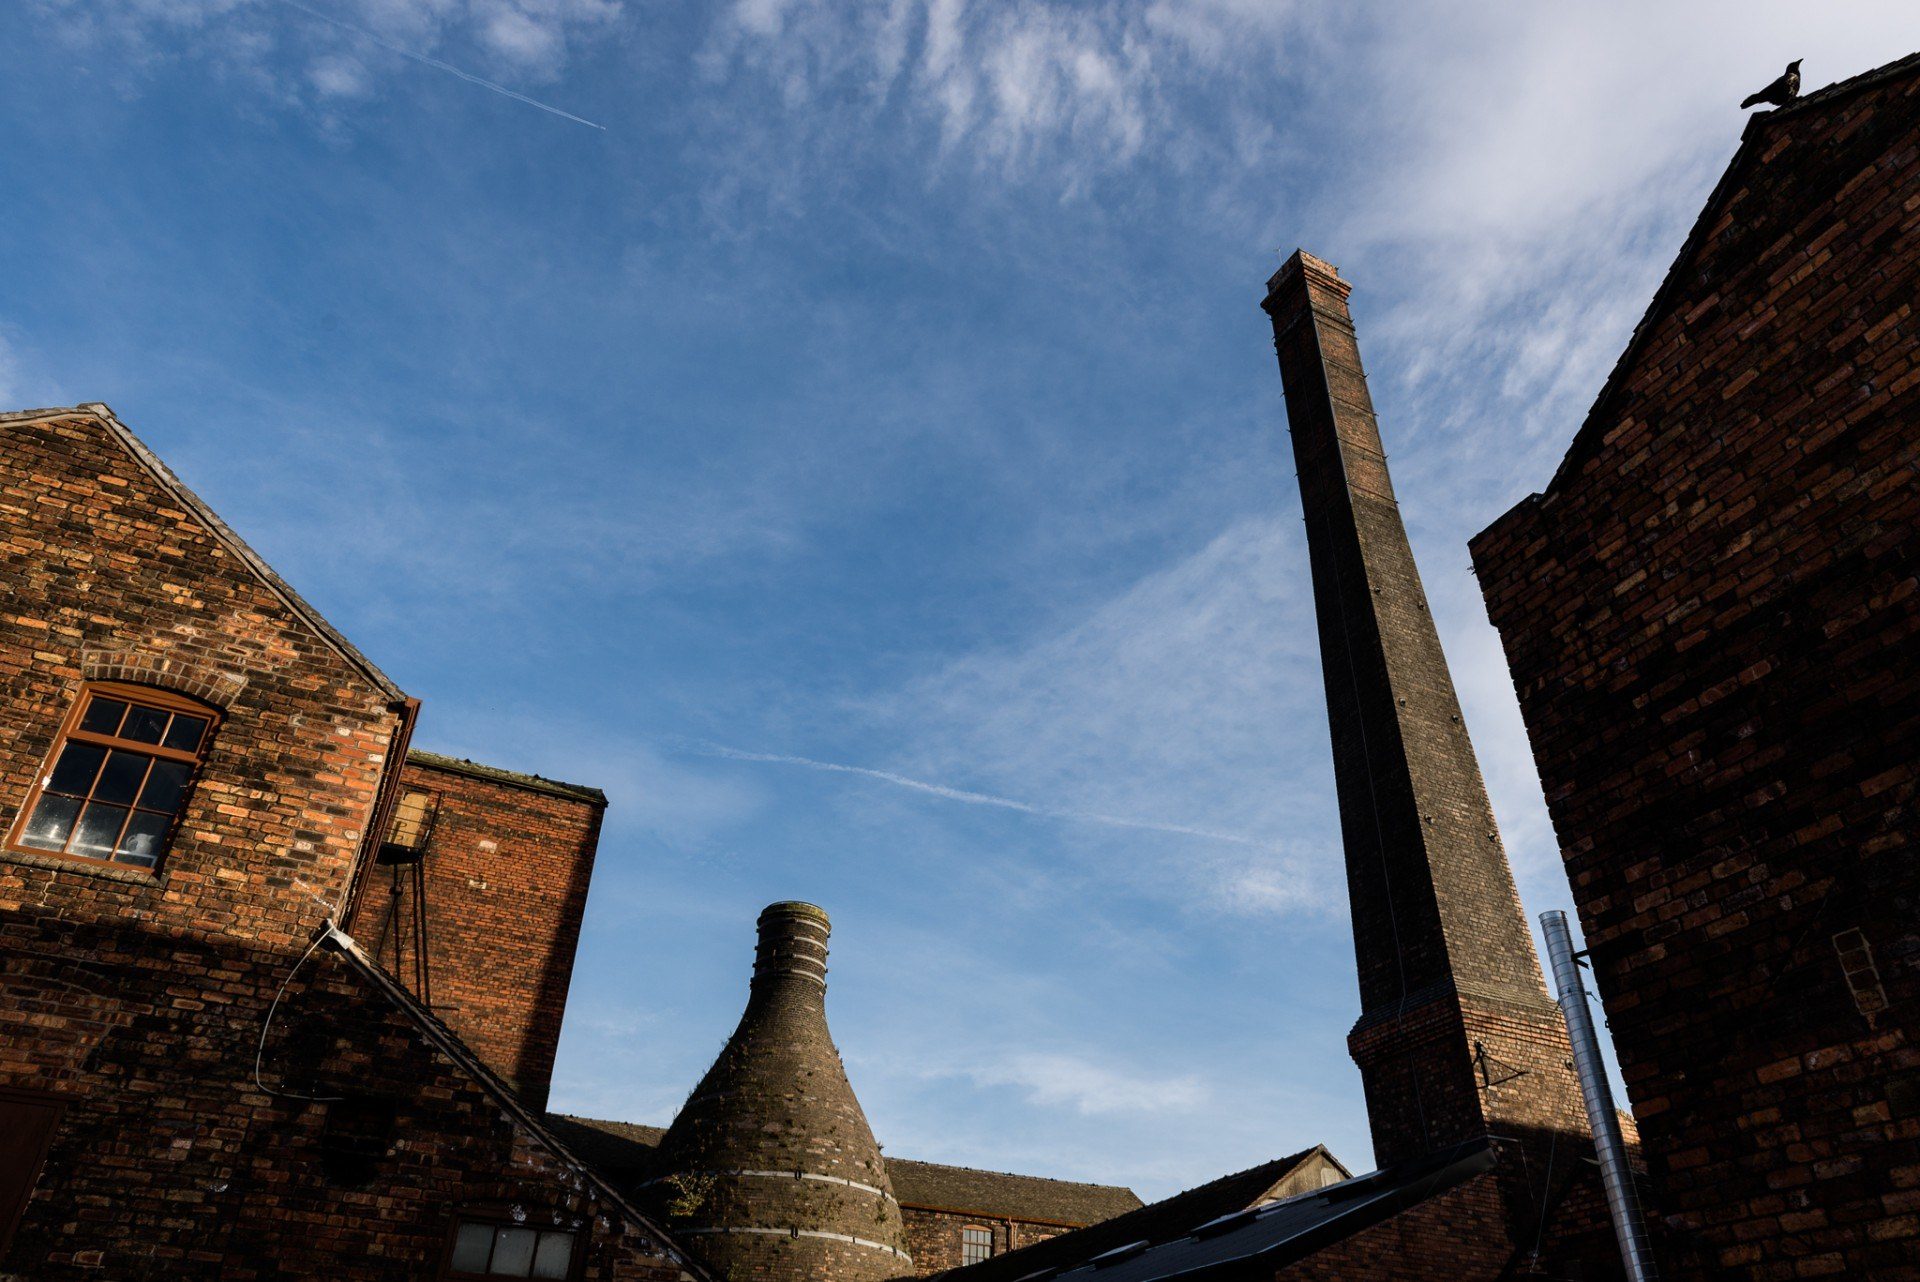 Middleport-Pottery-Factory-Tour-Potter-Clay-Heritage-135.jpg#asset:1120